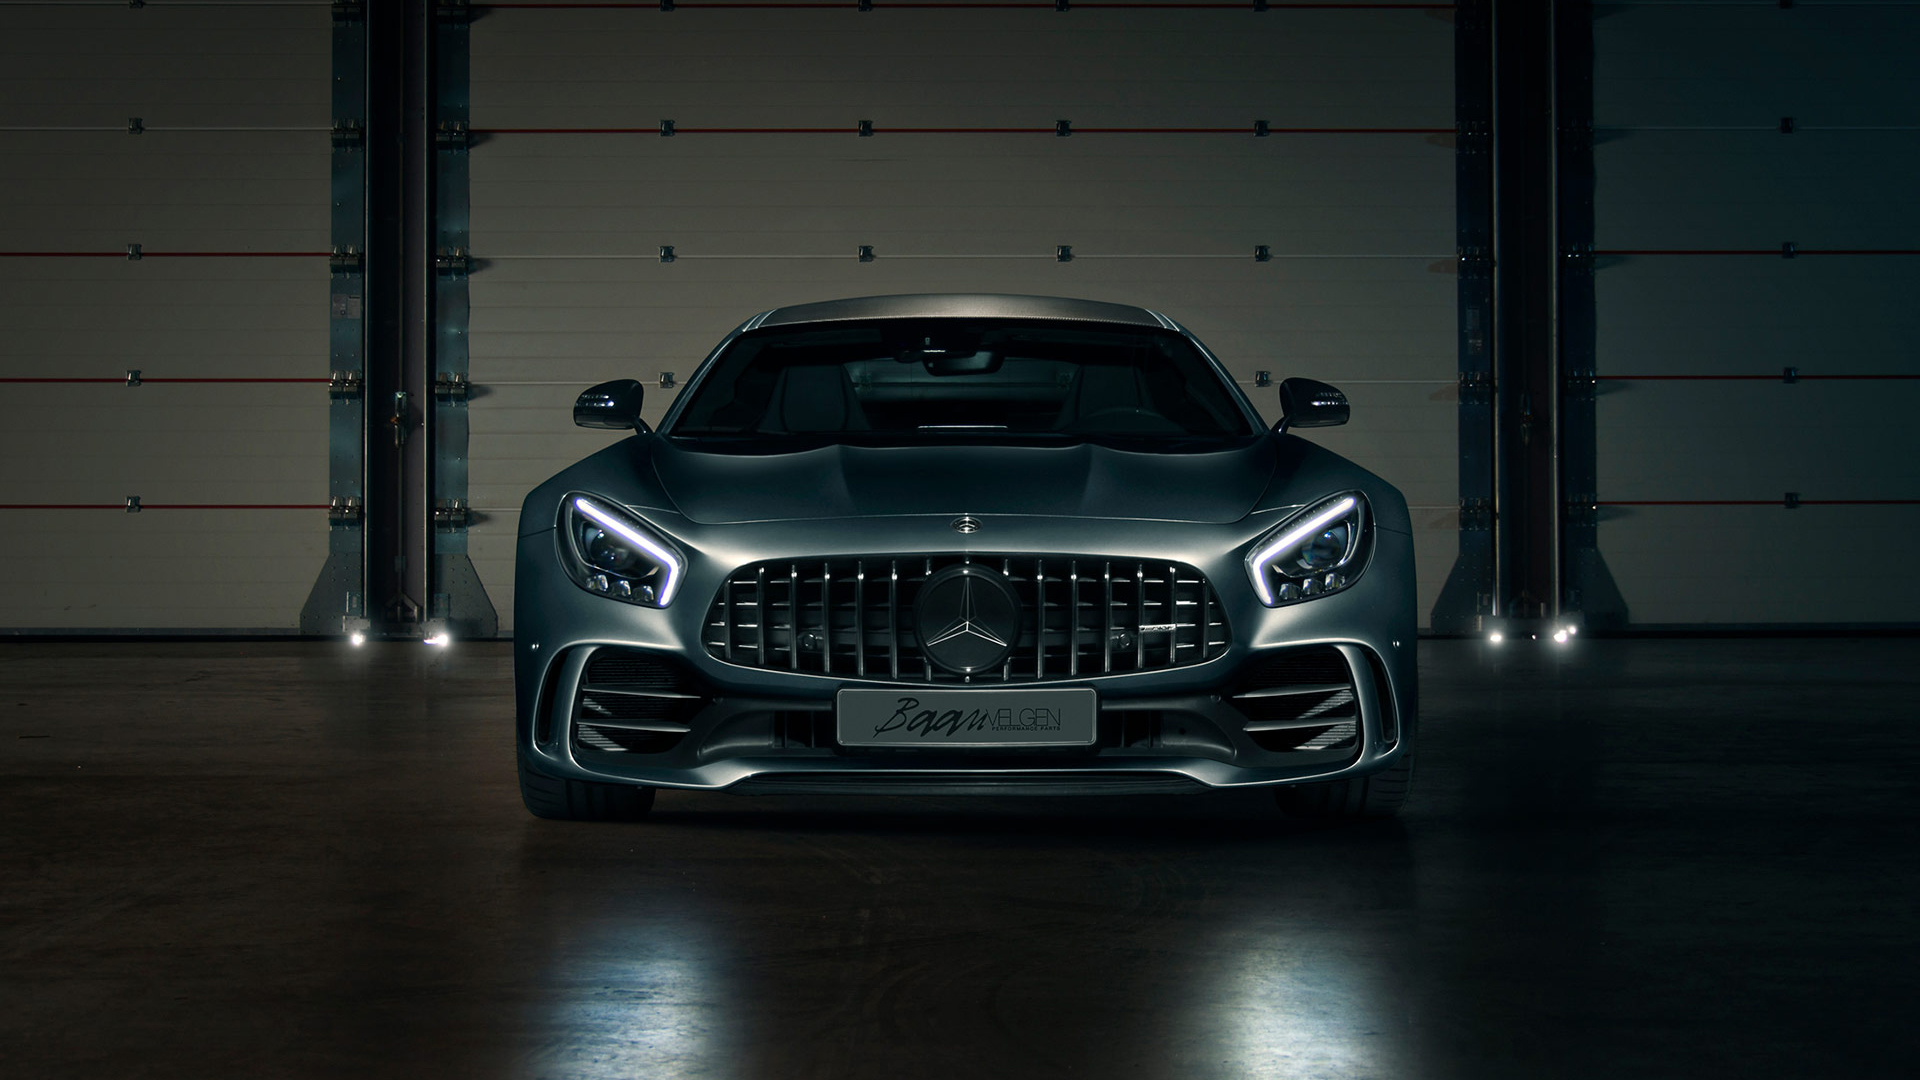 Mercedes Benz Plano >> Mercedes-AMG GT R ADV1 Wheels Wallpaper | HD Car Wallpapers | ID #11742